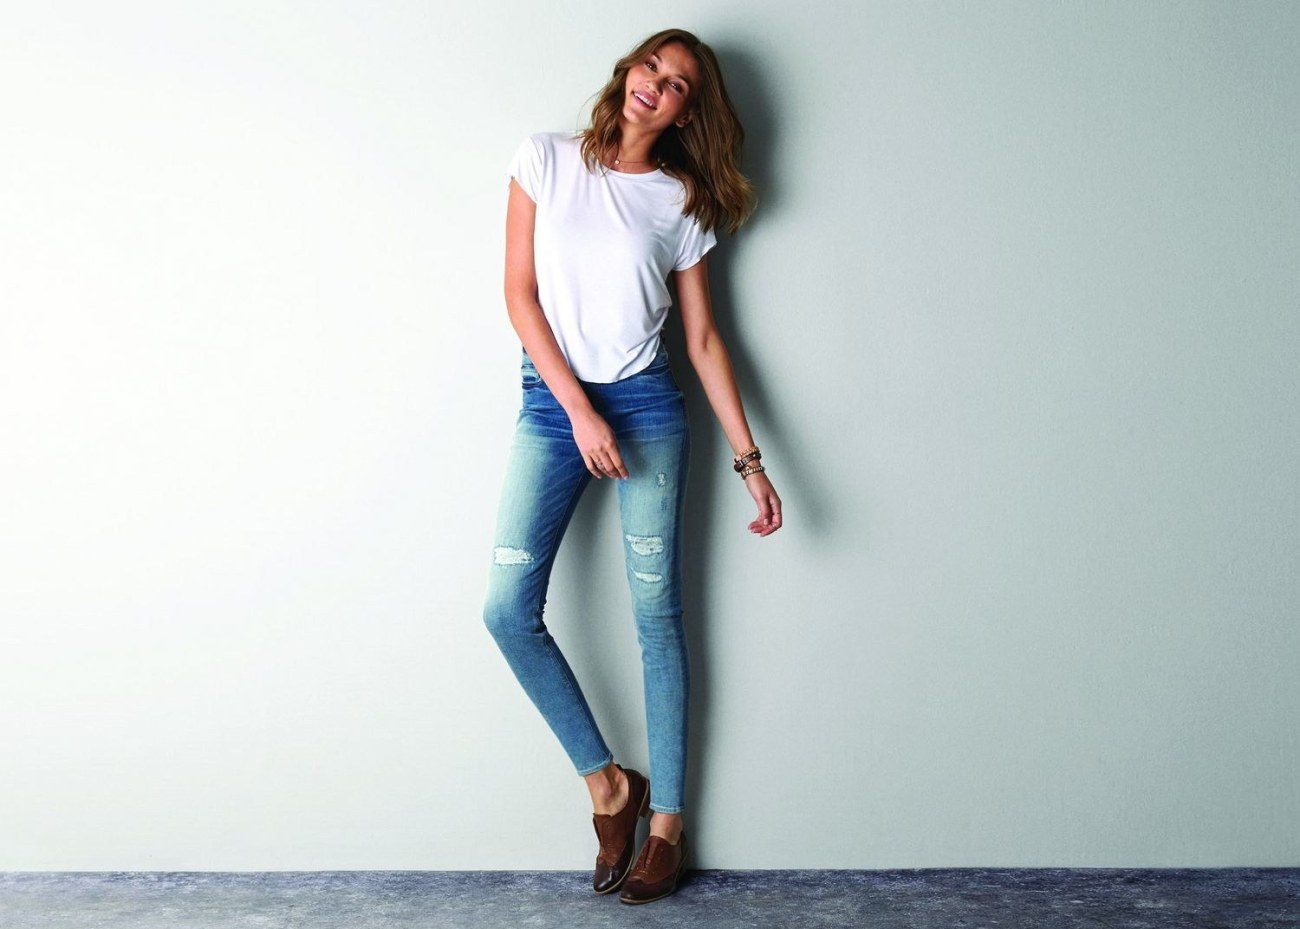 fashion-2015-01-american-eagle-skinny-jeans-white-t-shirt-main